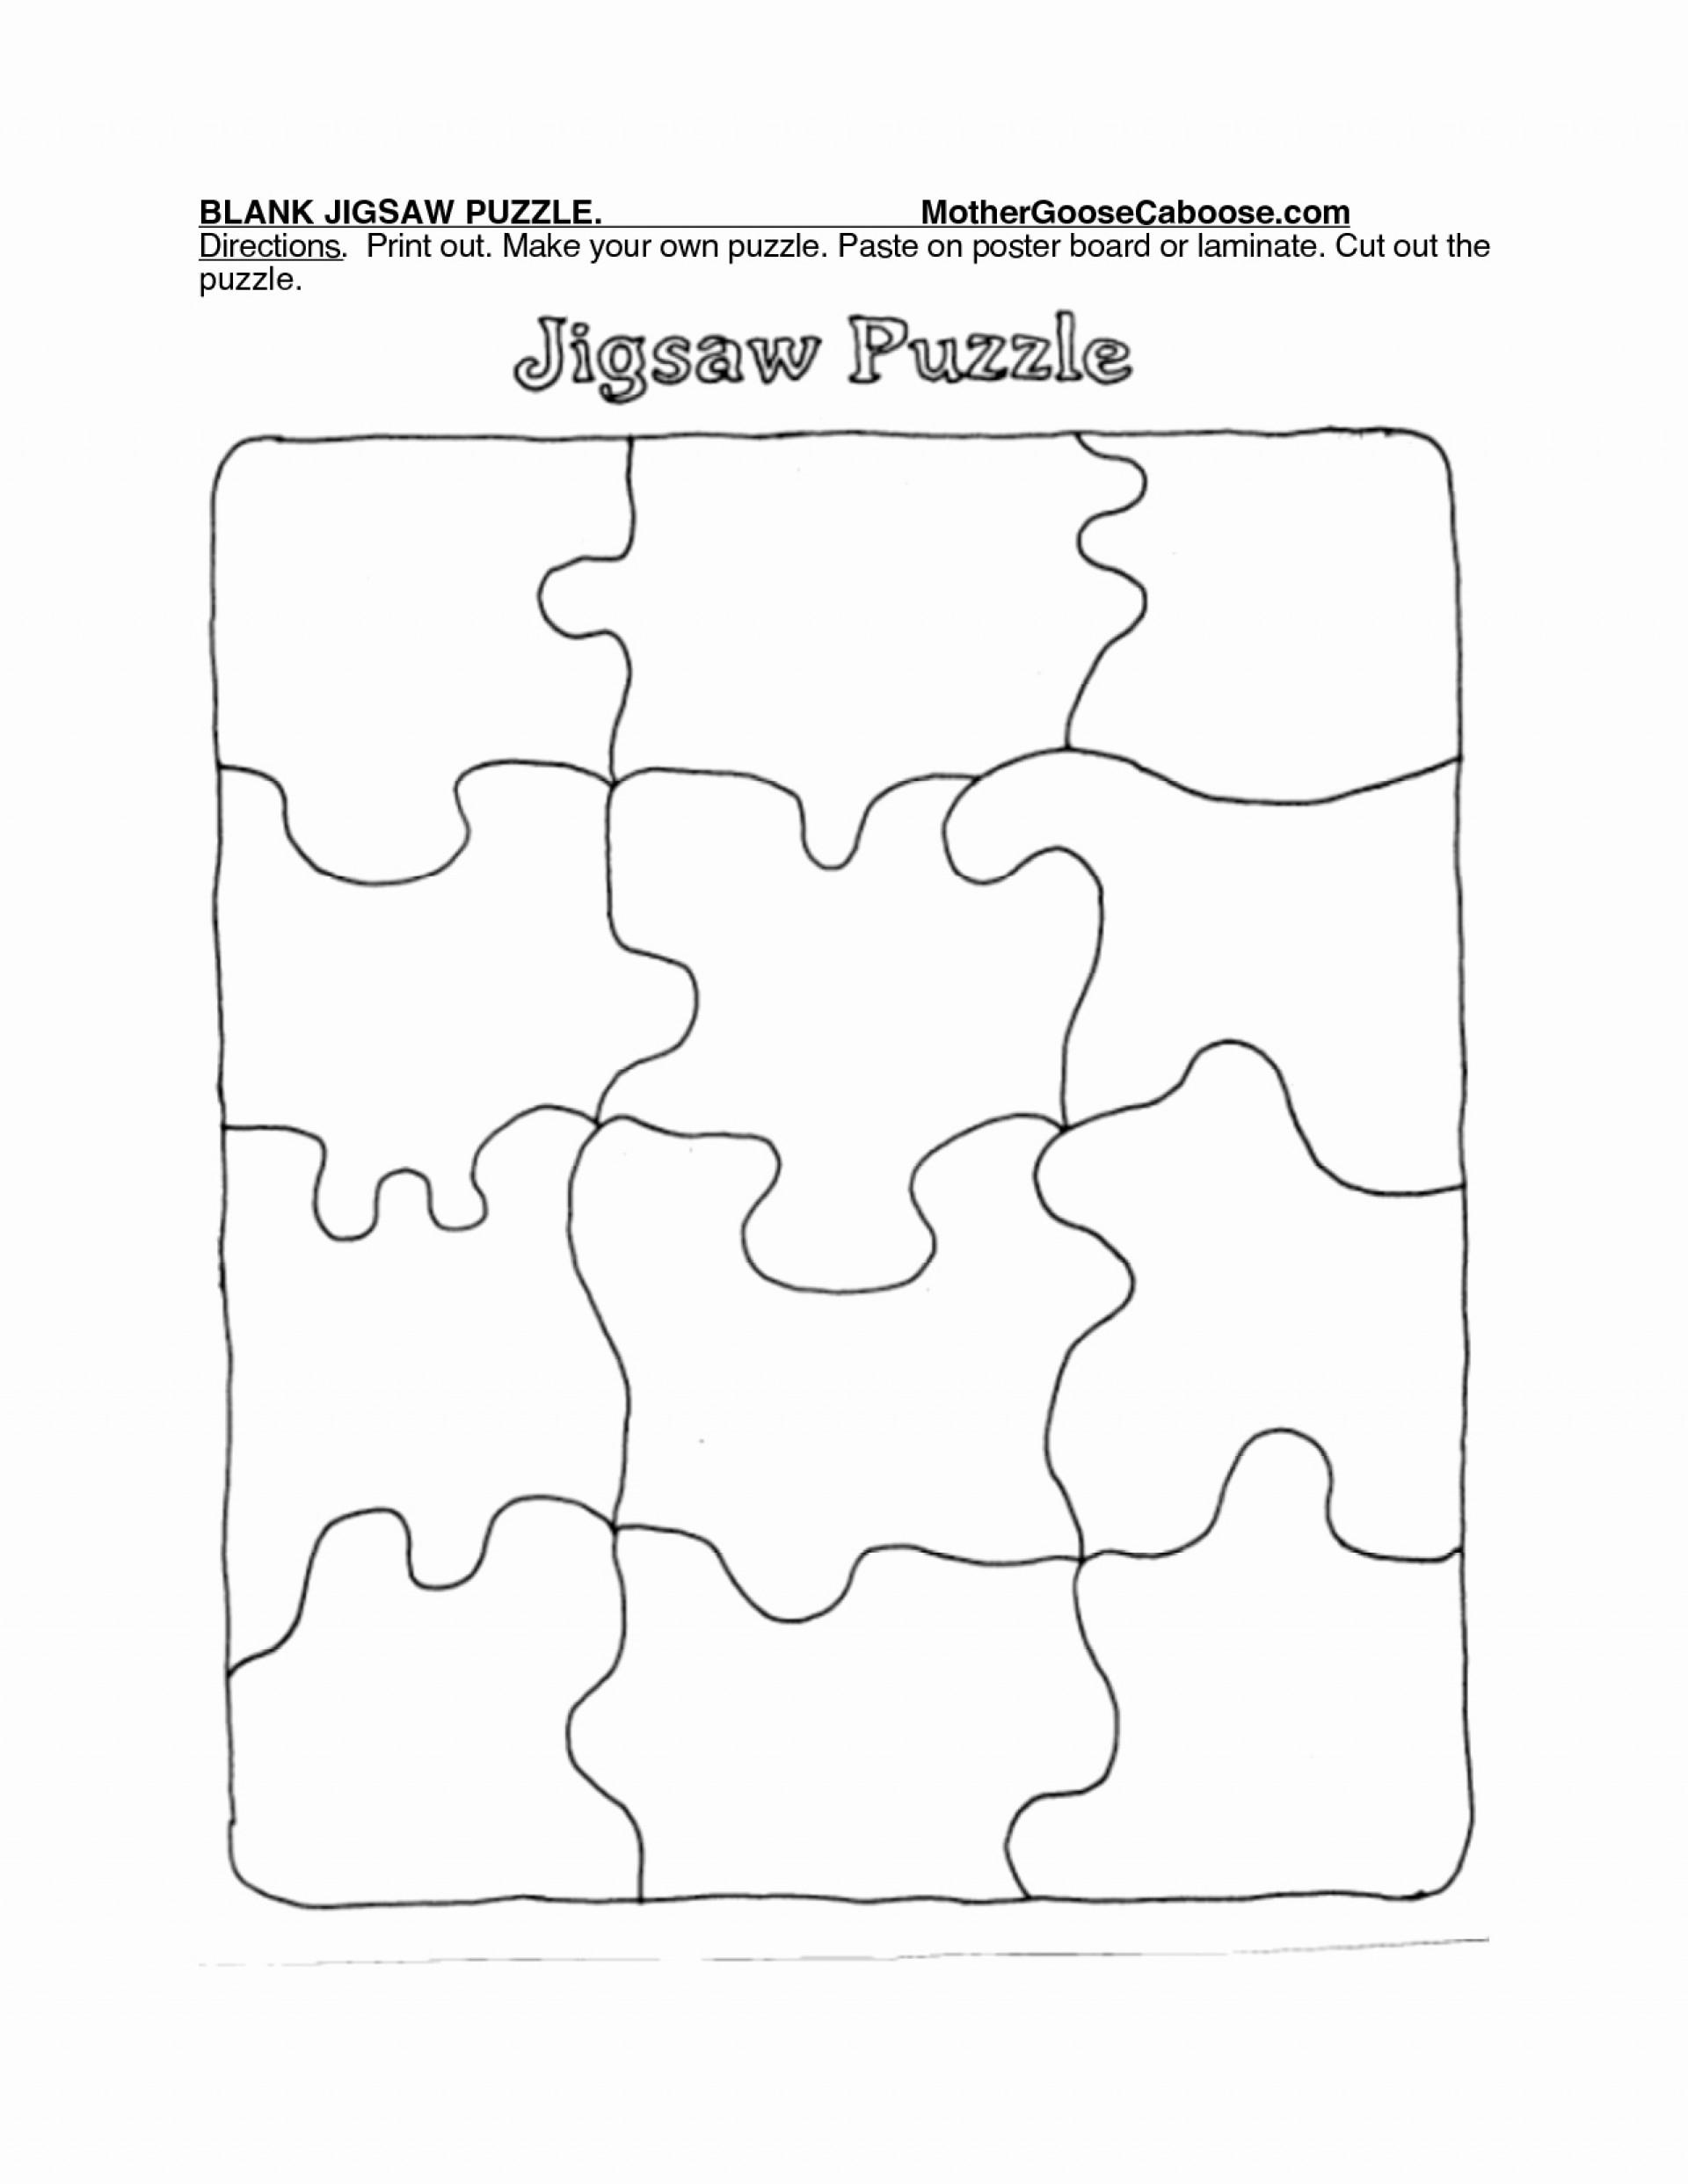 009 Blank Puzzle Pieces Template Best Ideas 9 Piece Jigsaw Pdf 6 - 6 Piece Printable Puzzle